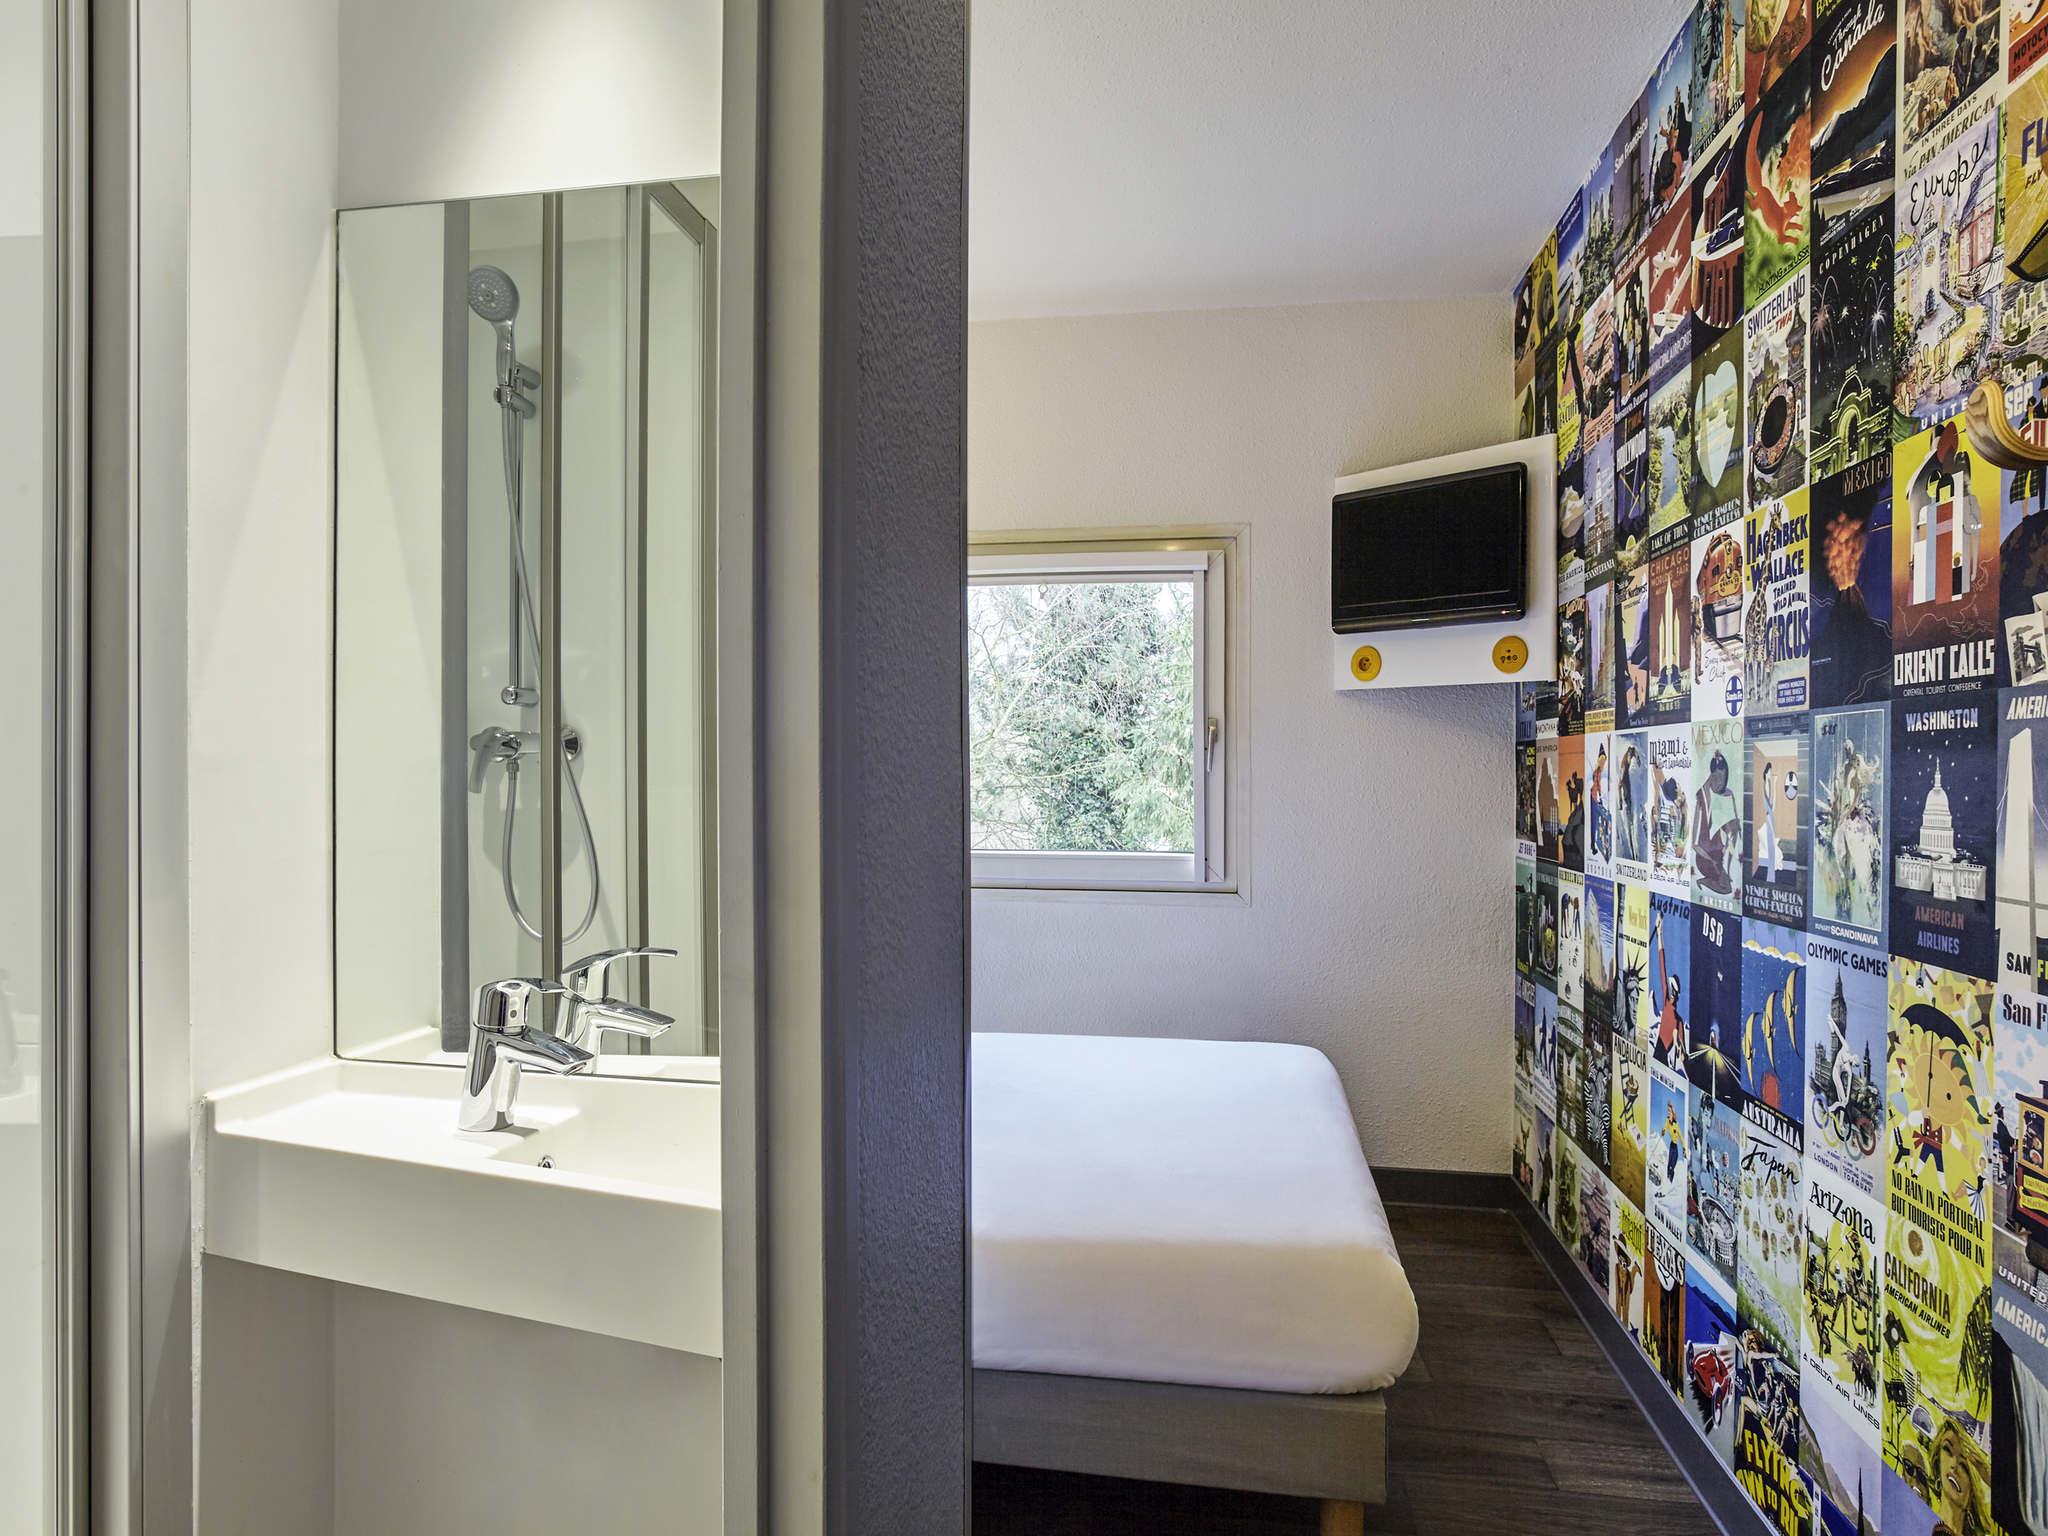 Hotel - hotelF1 Villemomble